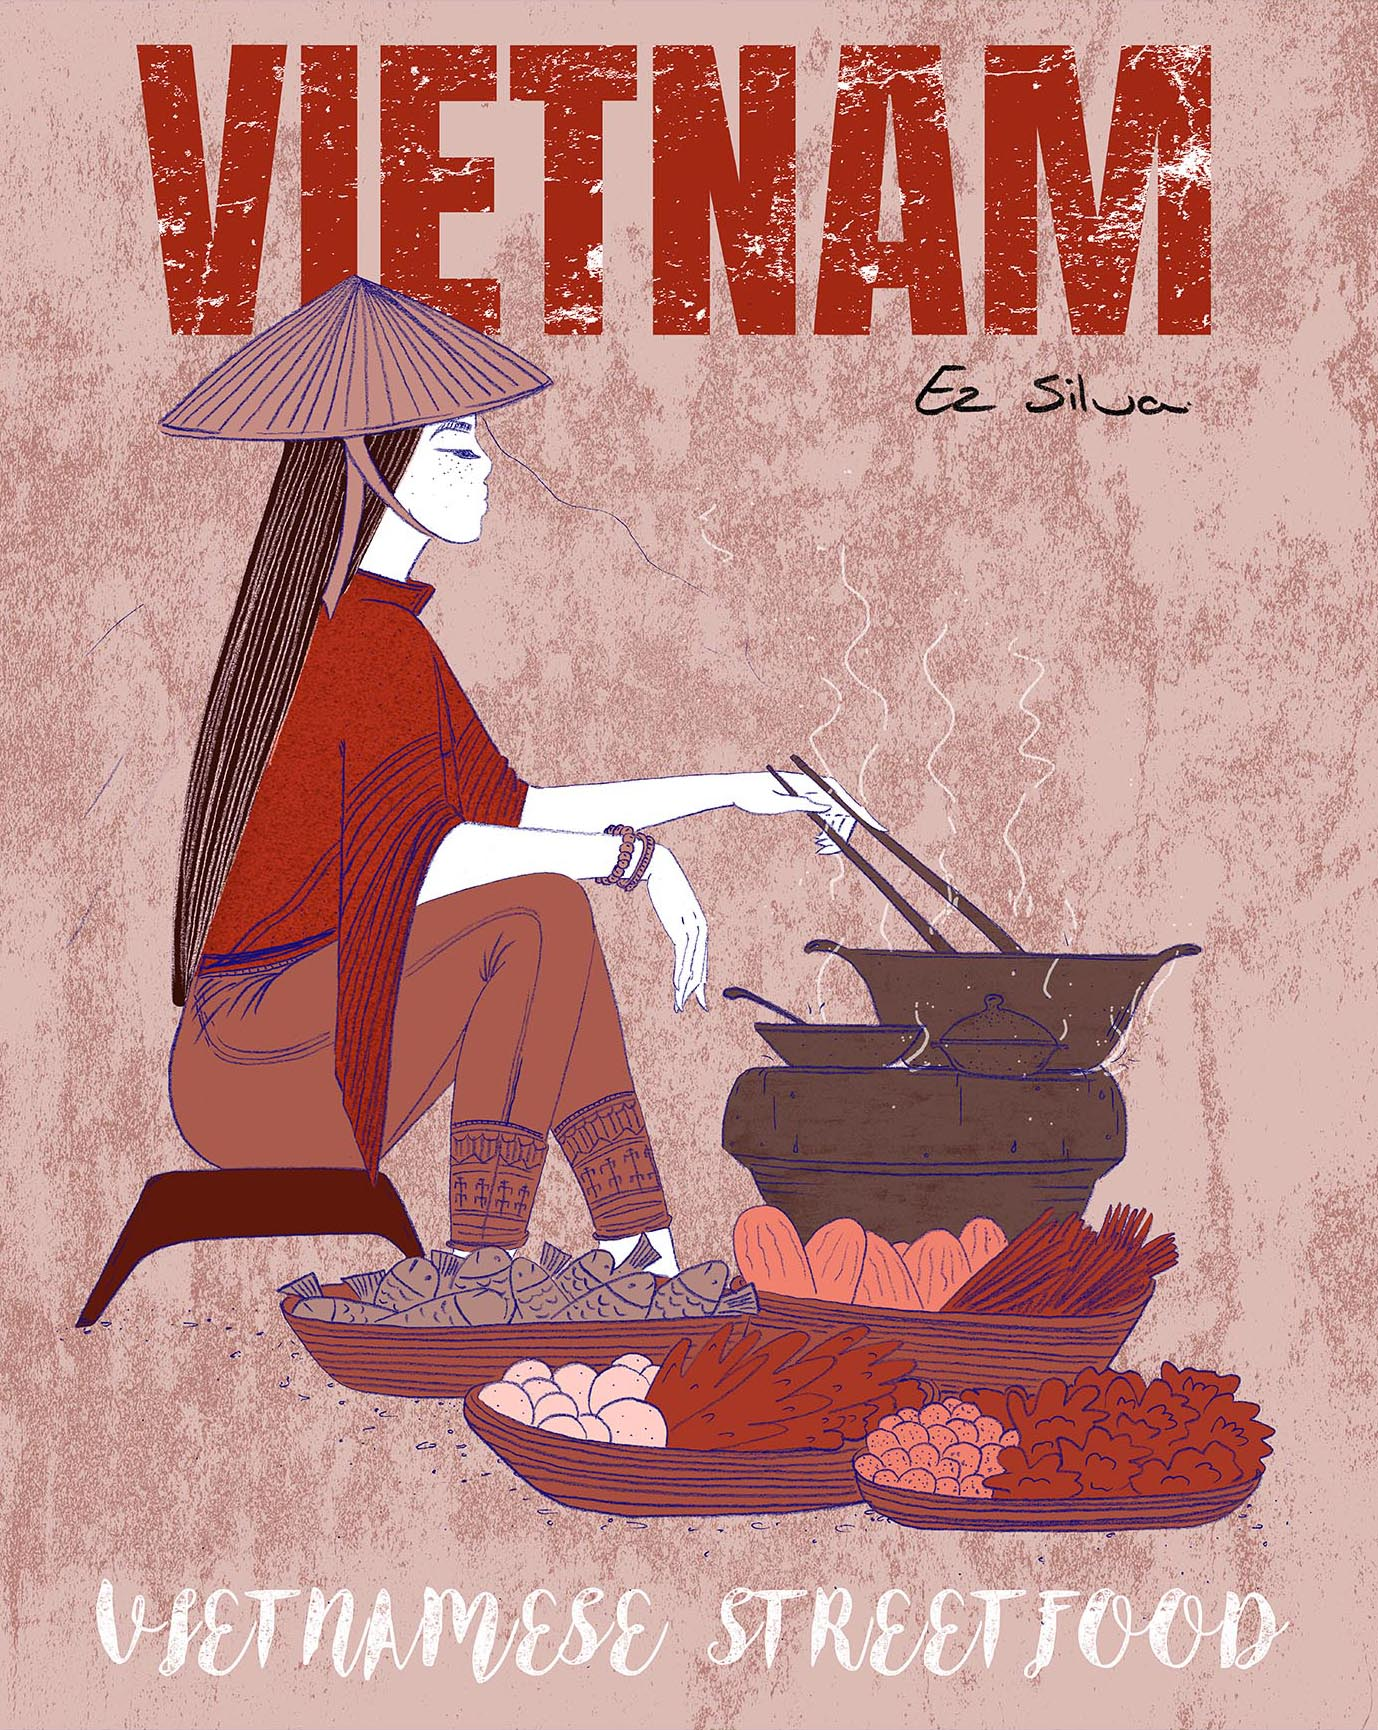 Vietnamese Streetfood - Poster Design